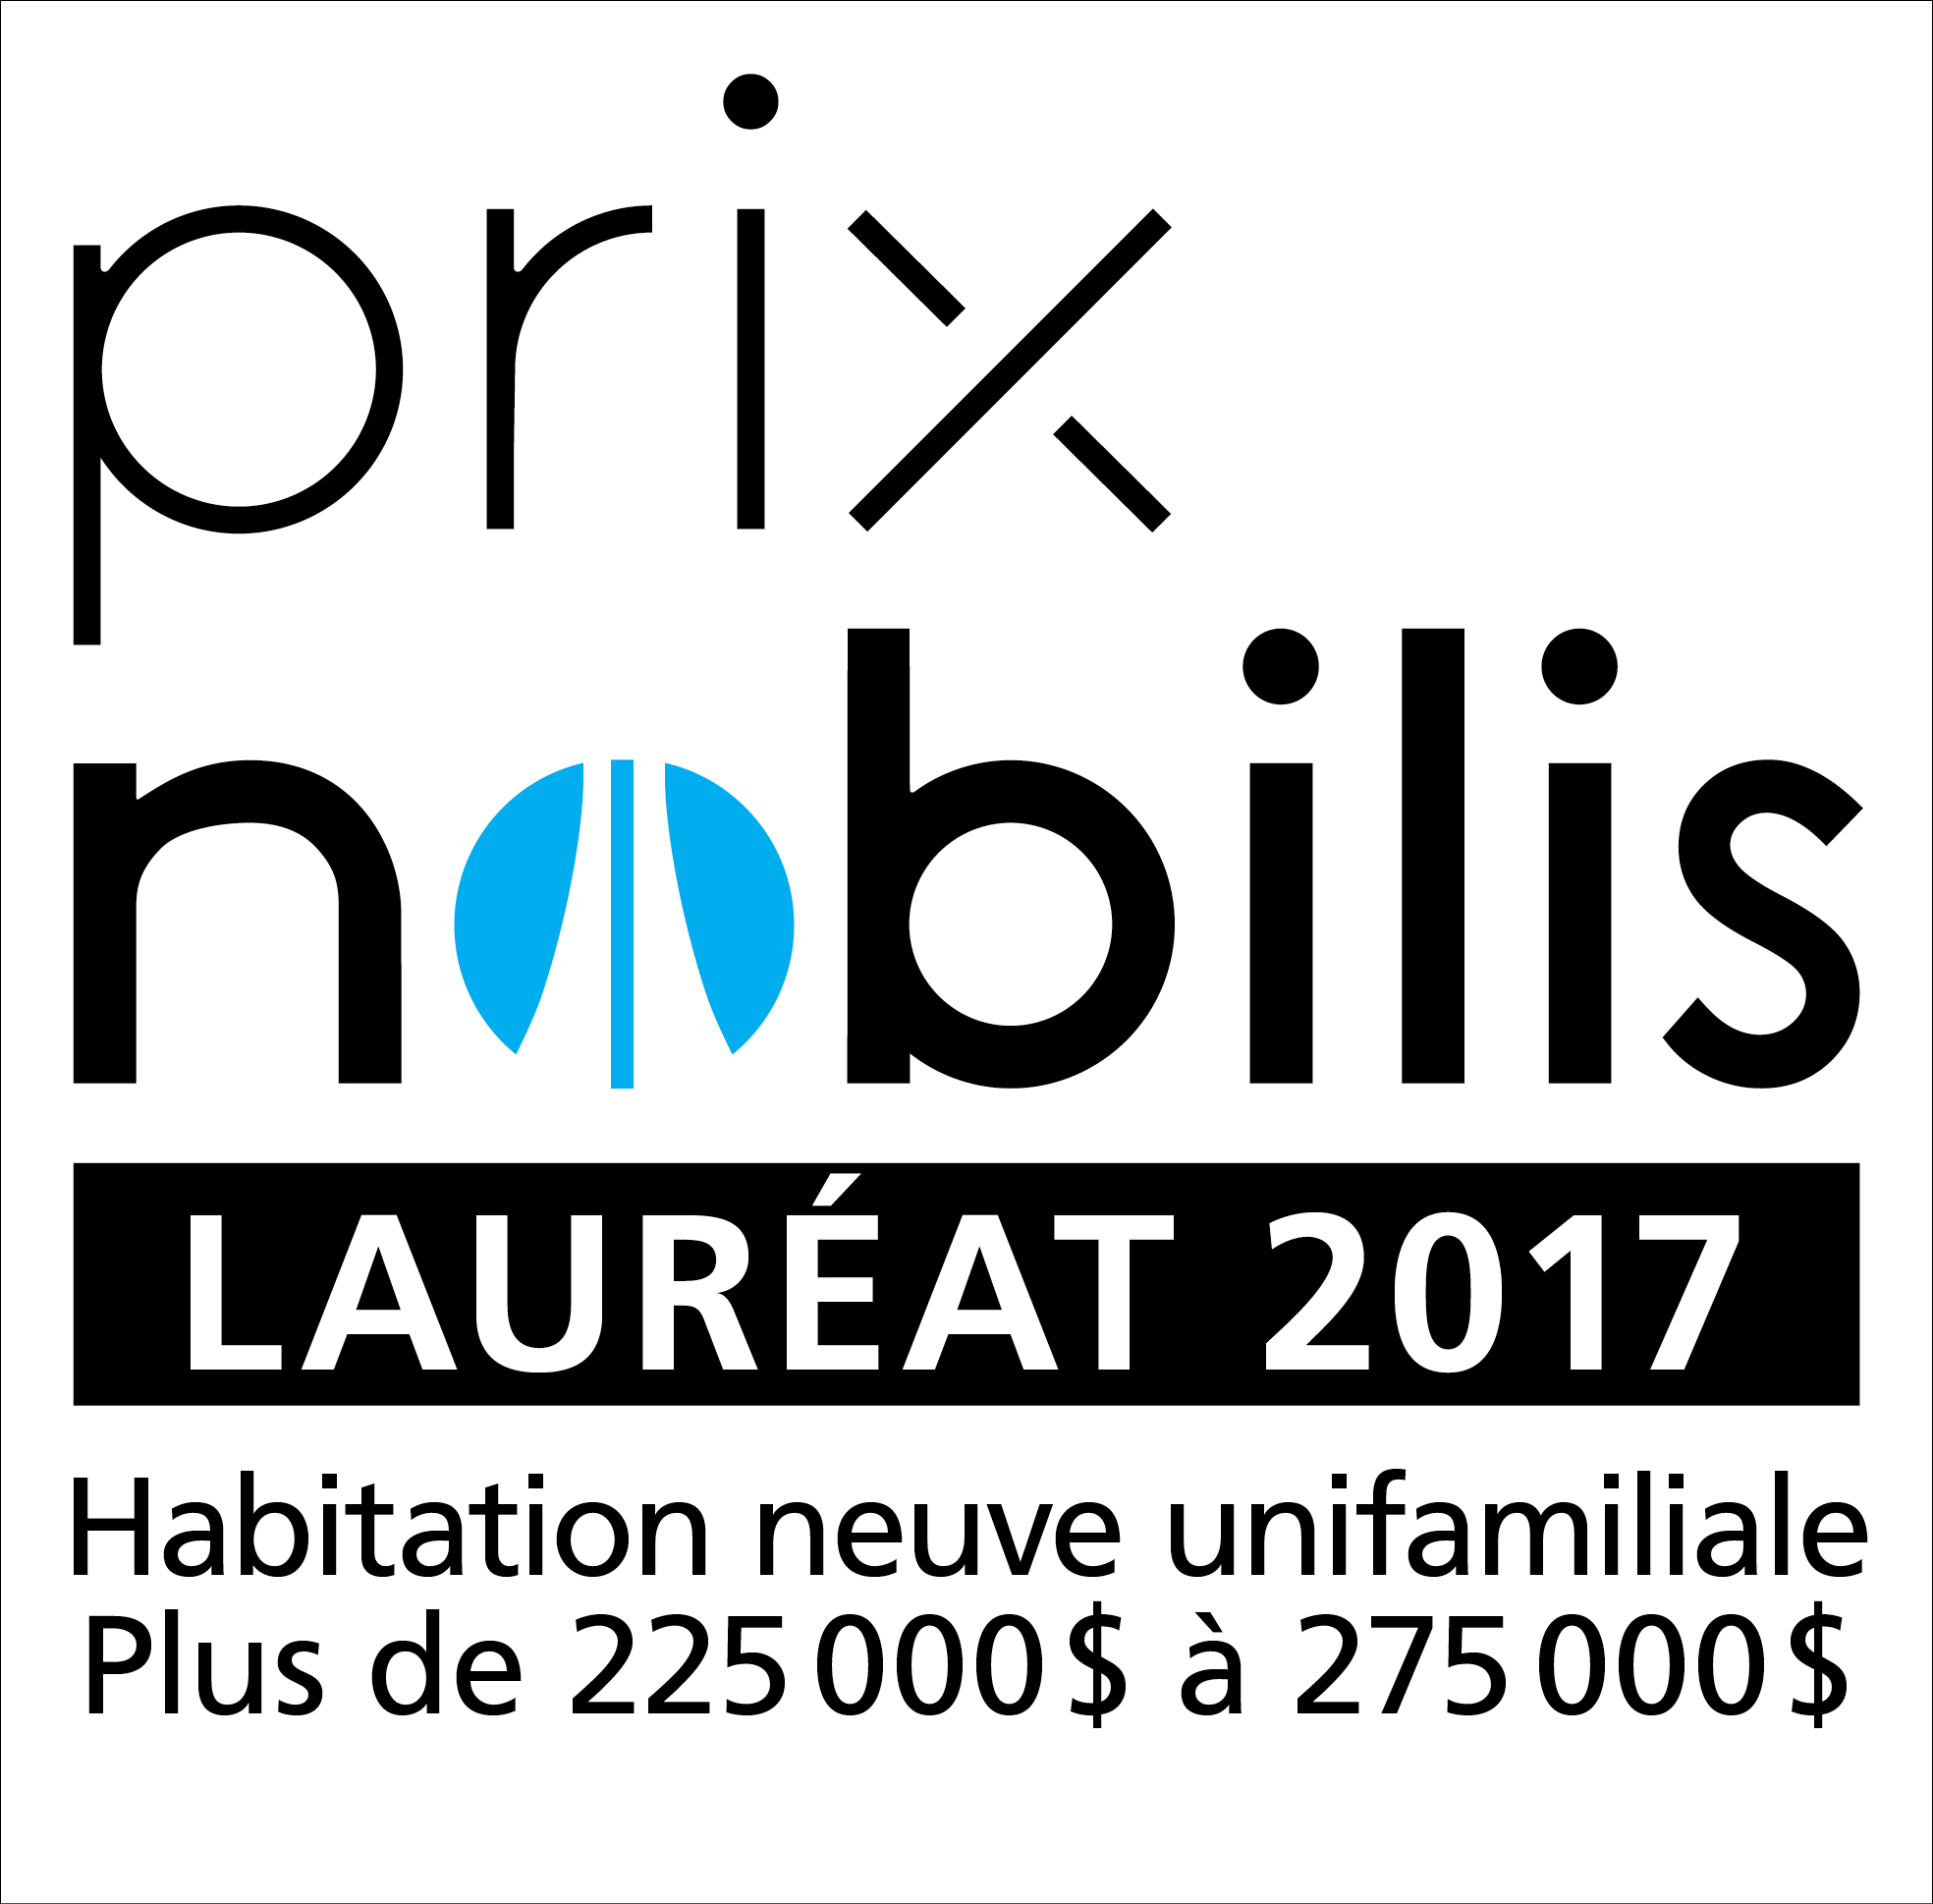 APCHQ_PrixNobilis2017_Laureat-20_Habitation_neuve_unifamiliale_225_000__a_275_000.jpg